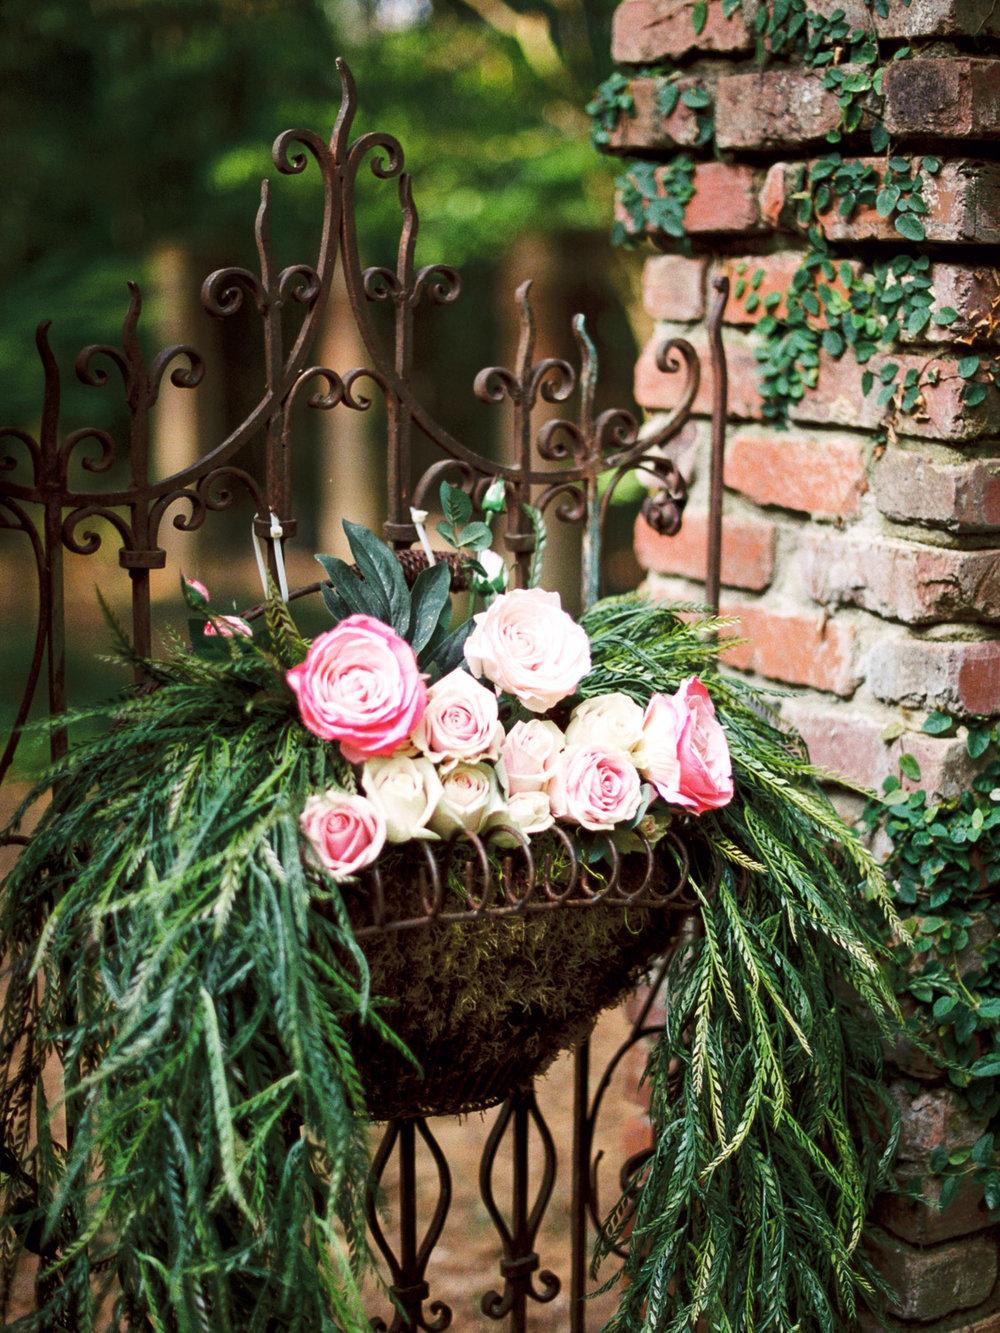 christinadavisphotography-romanticwedding-gardenweddinginspiration45.jpg